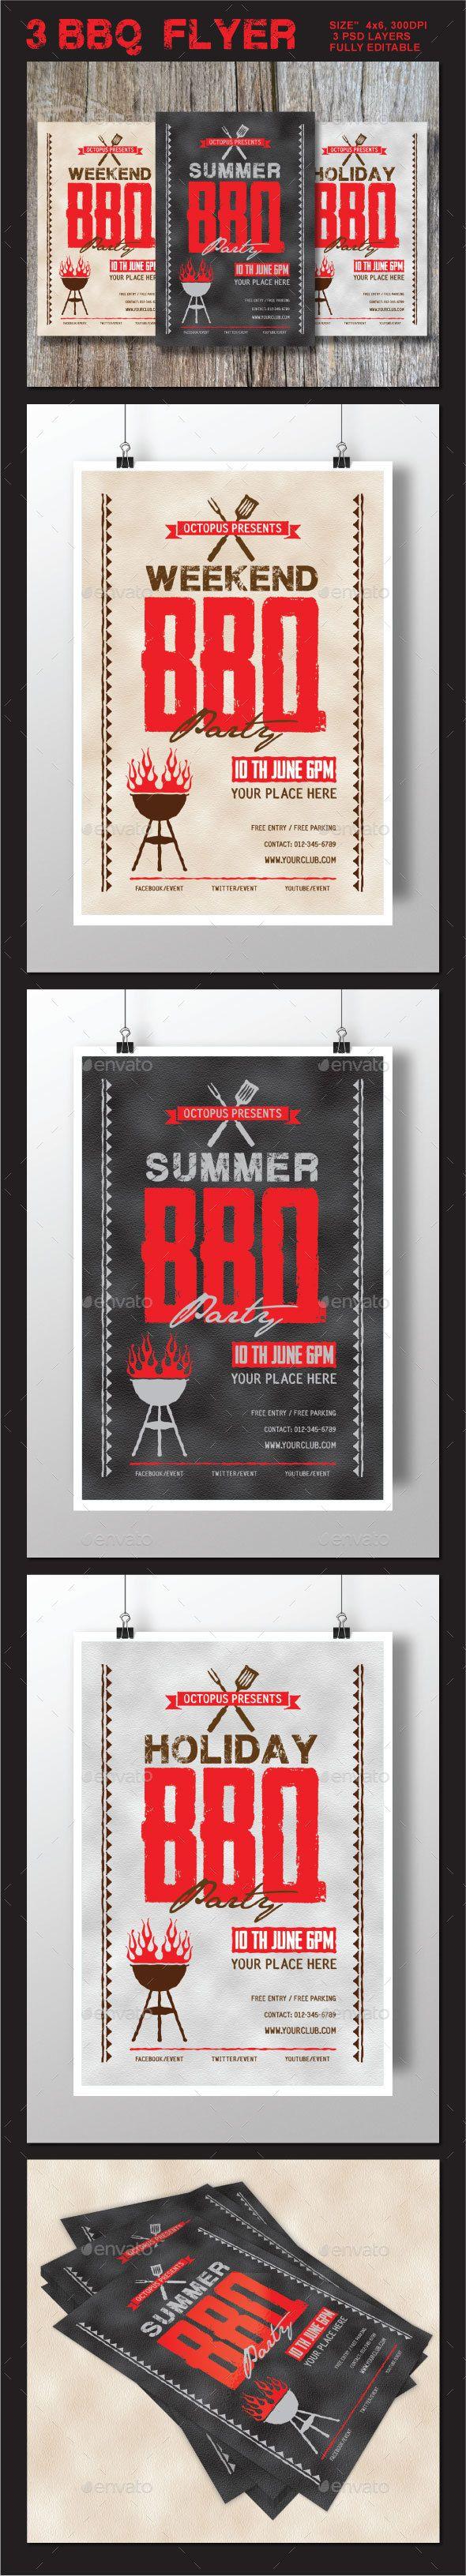 58 best fundraiser event images on pinterest backyard bbq